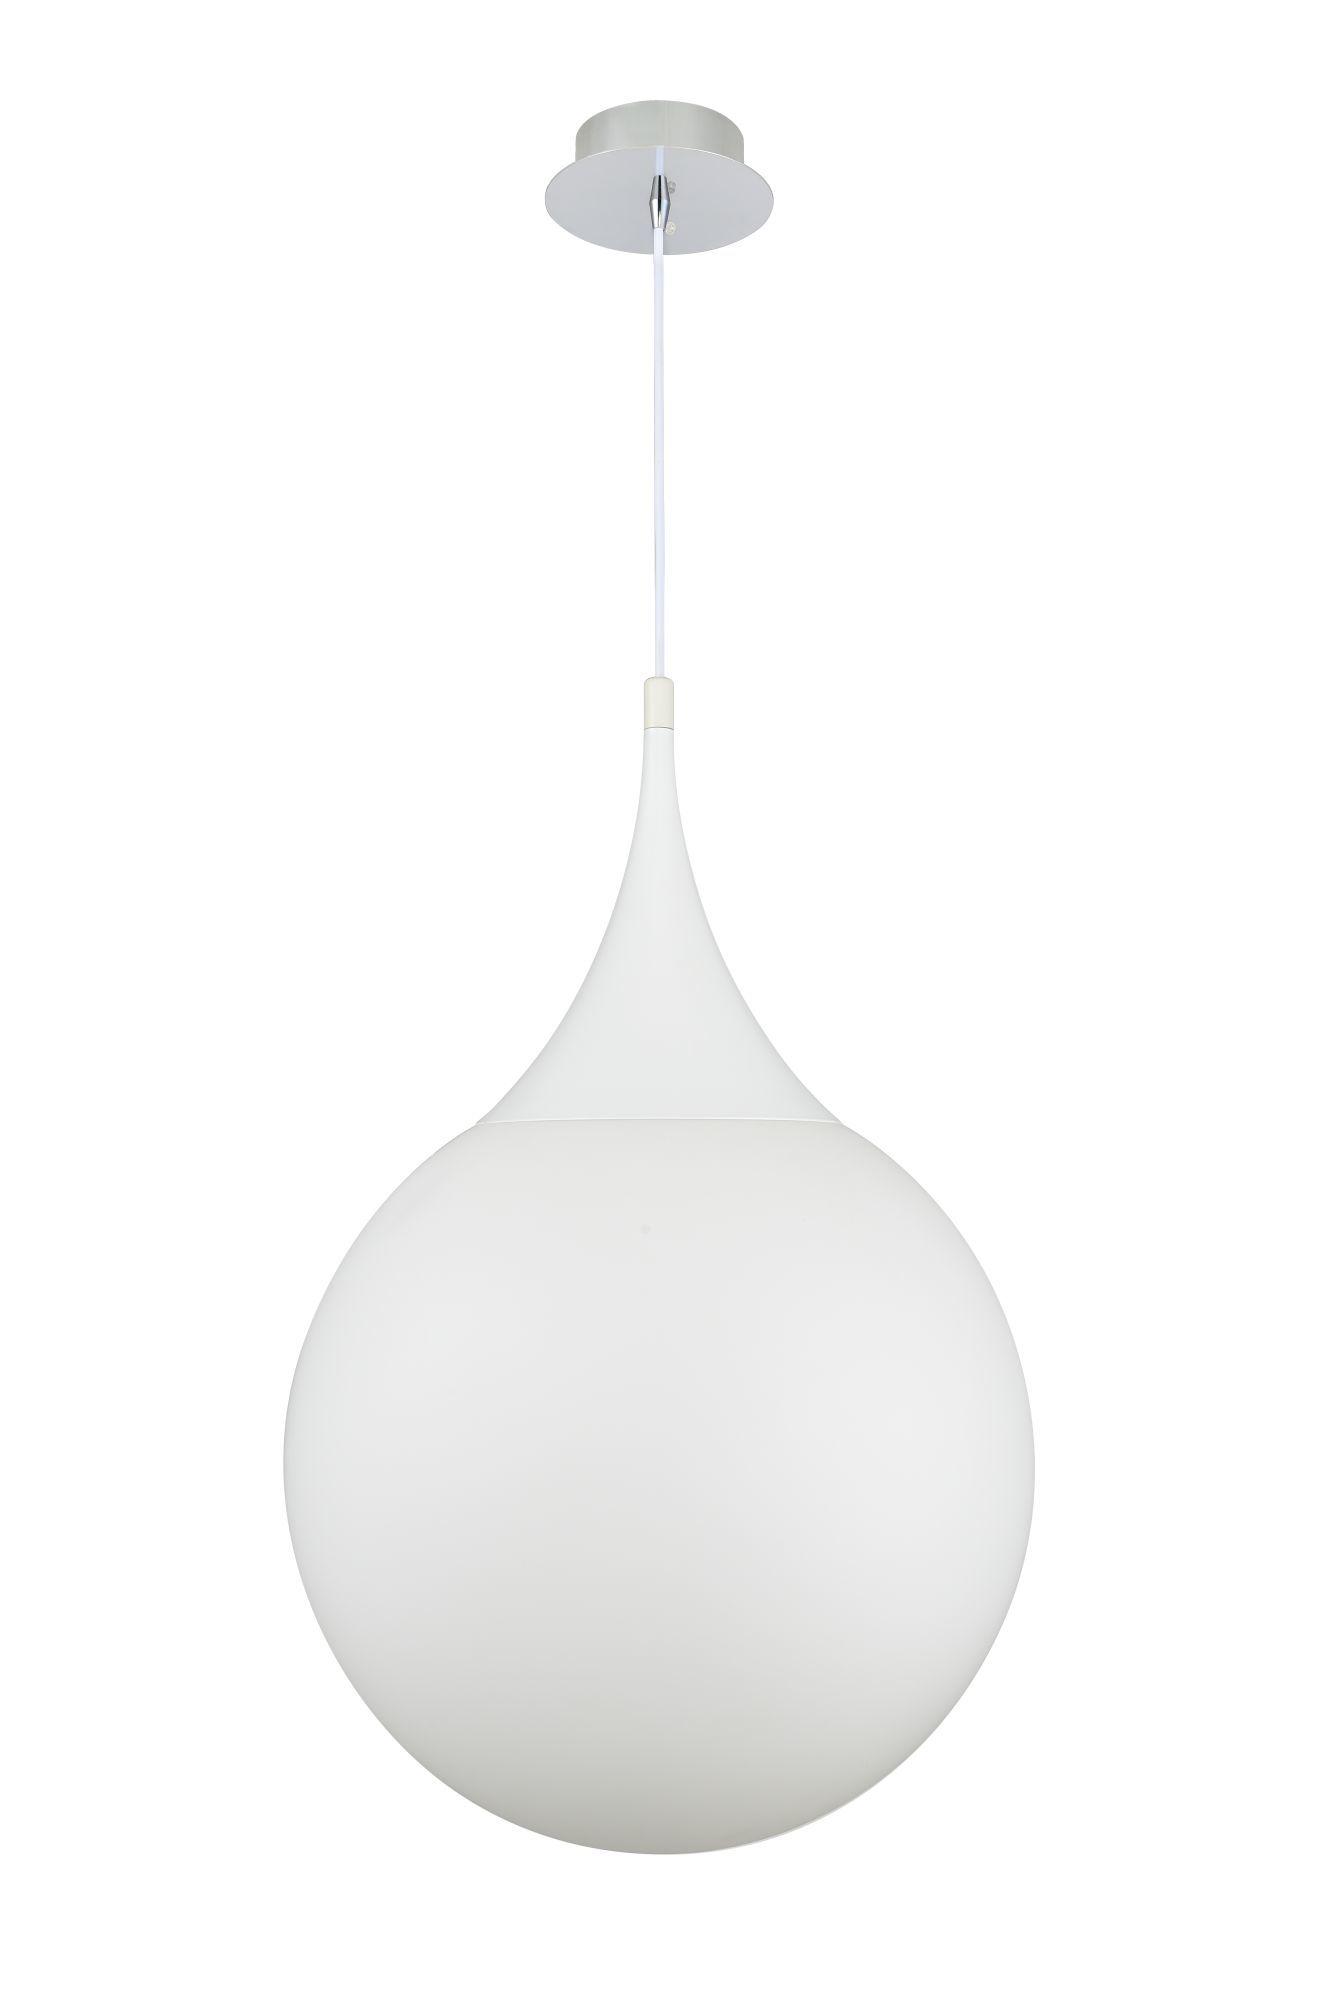 Подвесной светильник Maytoni Dewdrop P225-PL-400-N (mod225-40-n), 1xE27x8W, белый, металл, стекло - фото 3